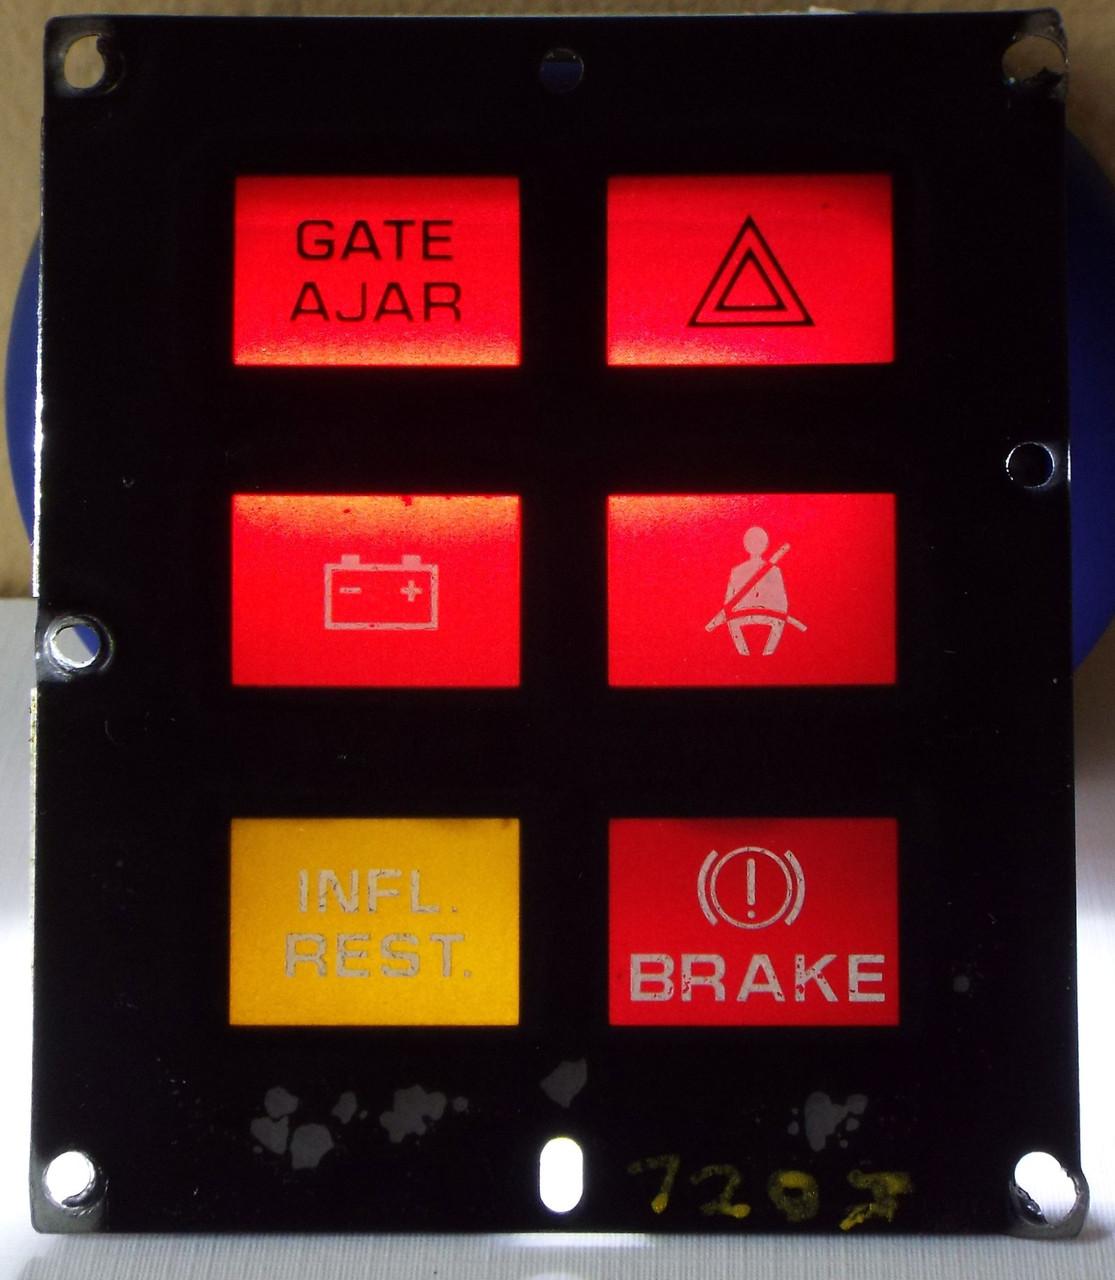 1993 Chevrolet Caprice Warning Lights Panel 1992 Chevrolet Caprice Warning Lights Panel 1991 Chevrolet Caprice Warning Lights Panel